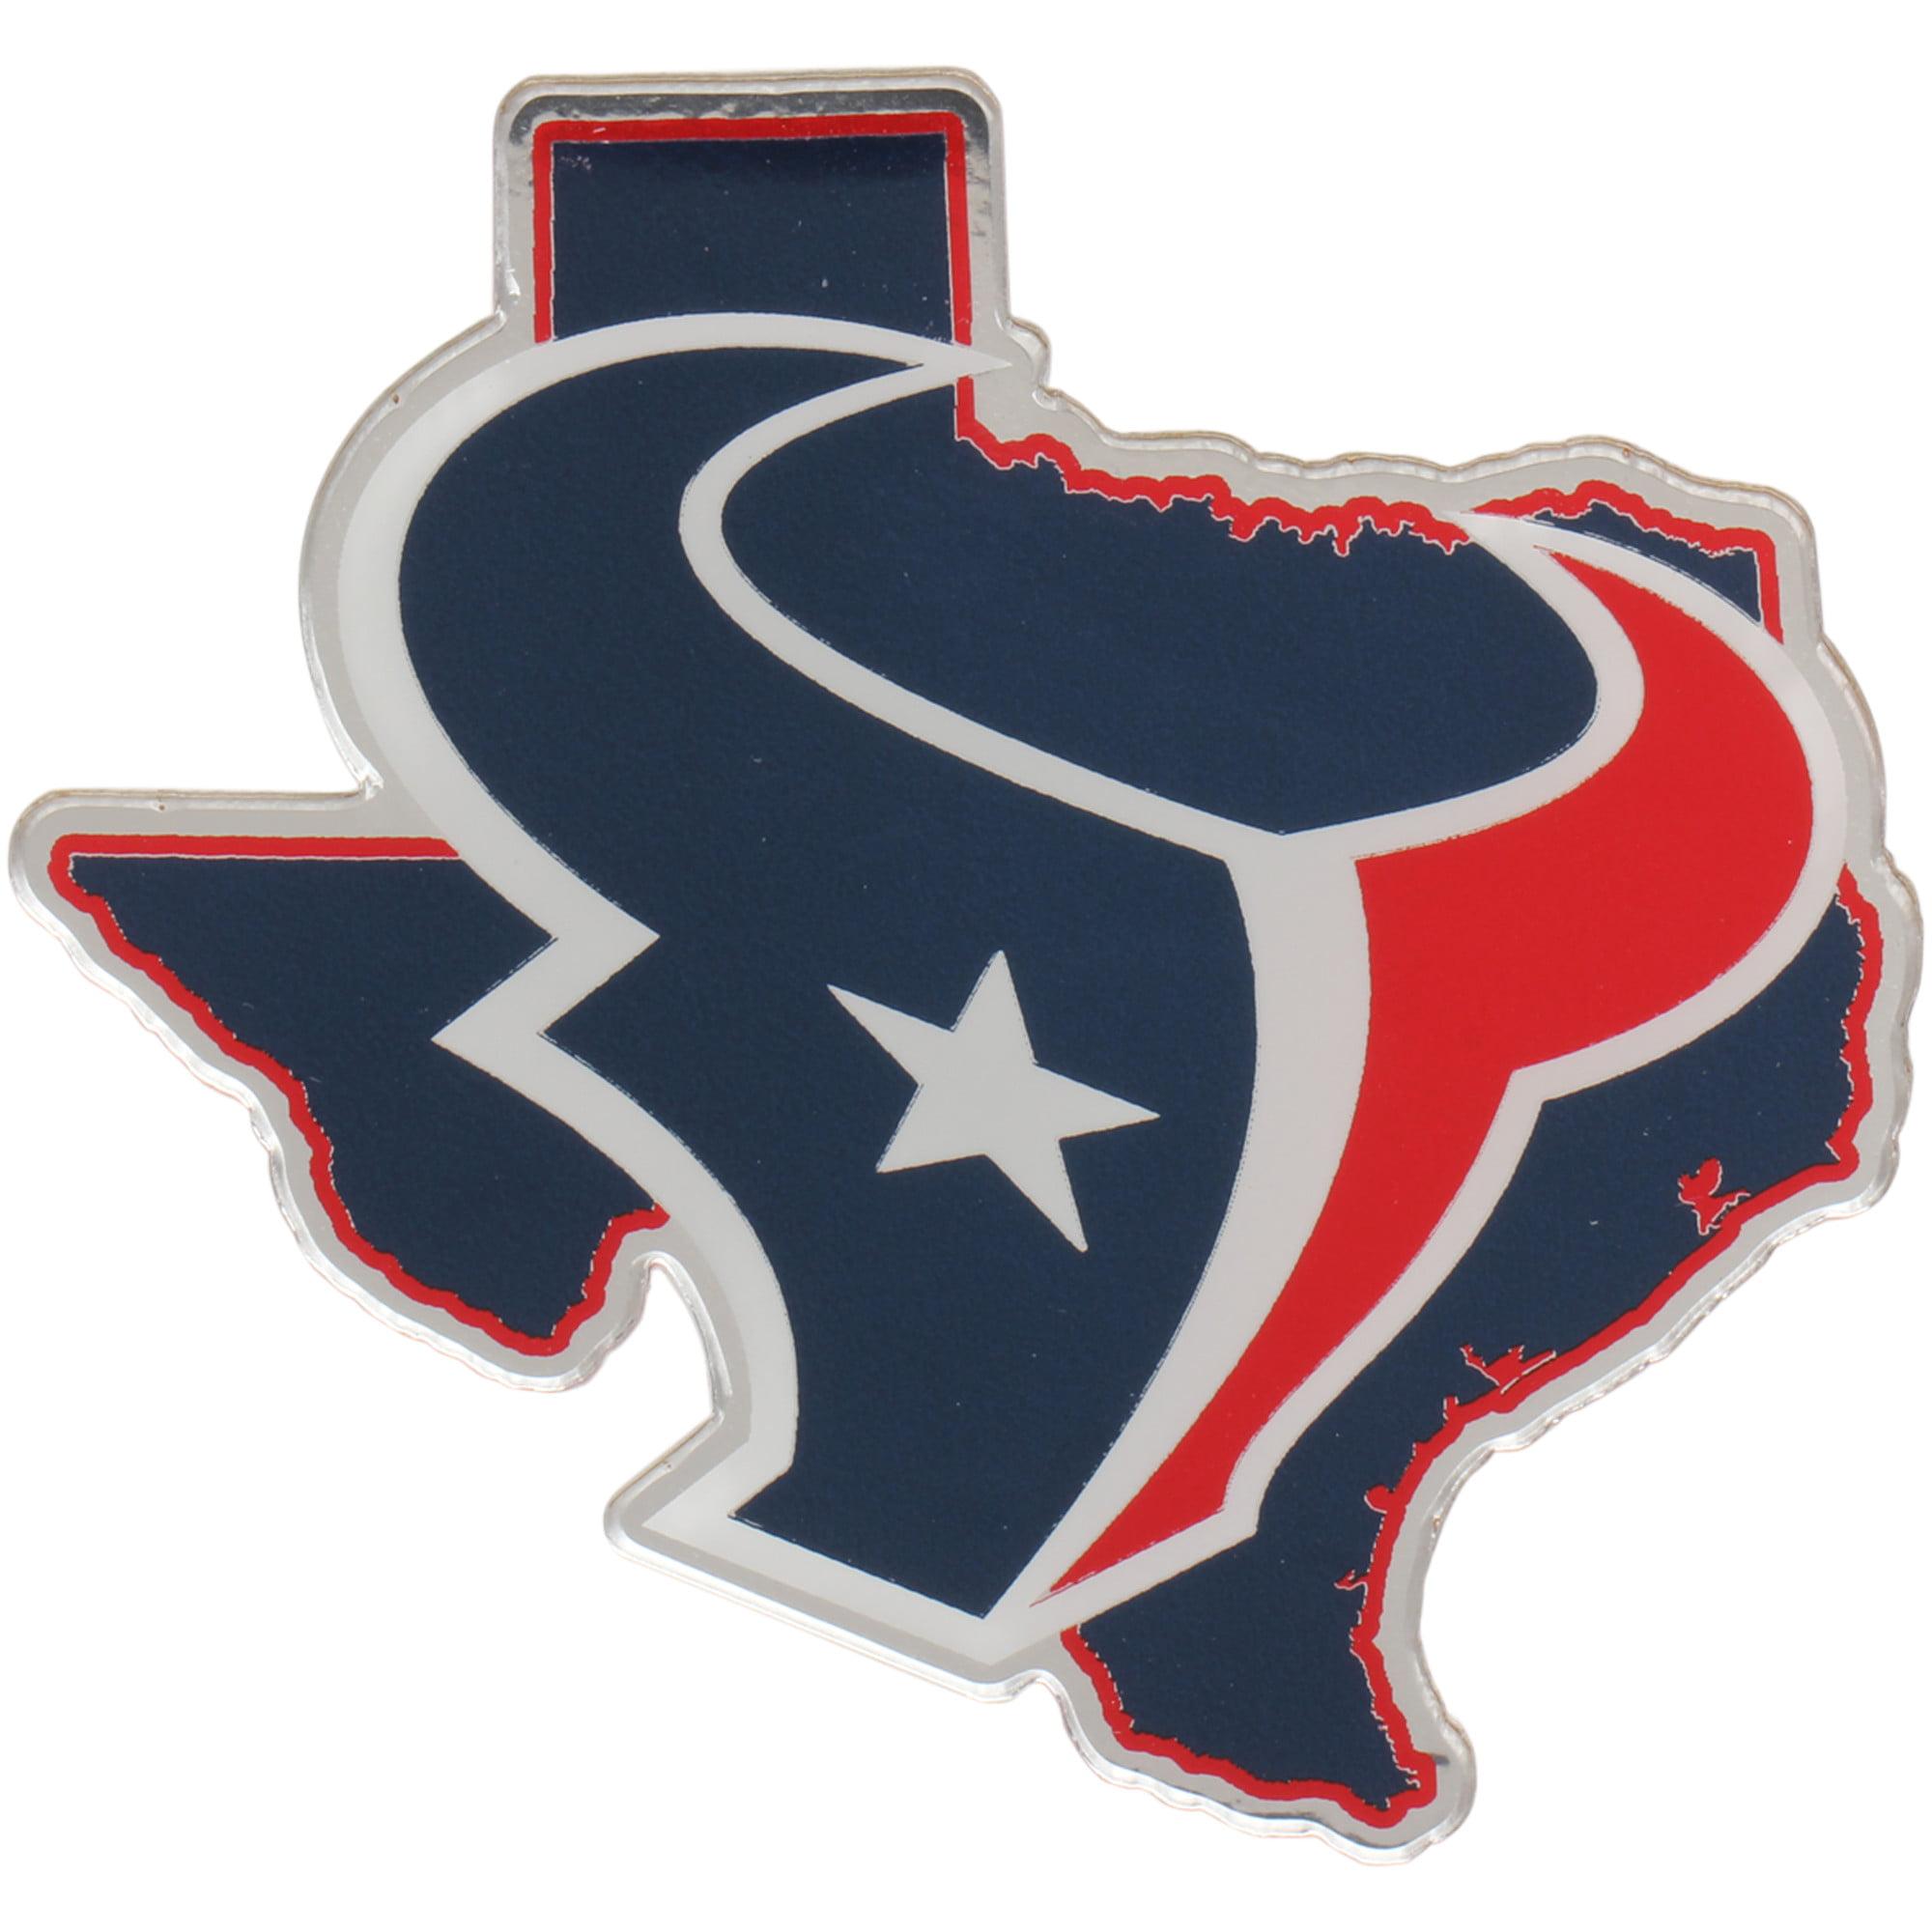 Houston Texans State Shape Acrylic Metallic Auto Emblem - No Size